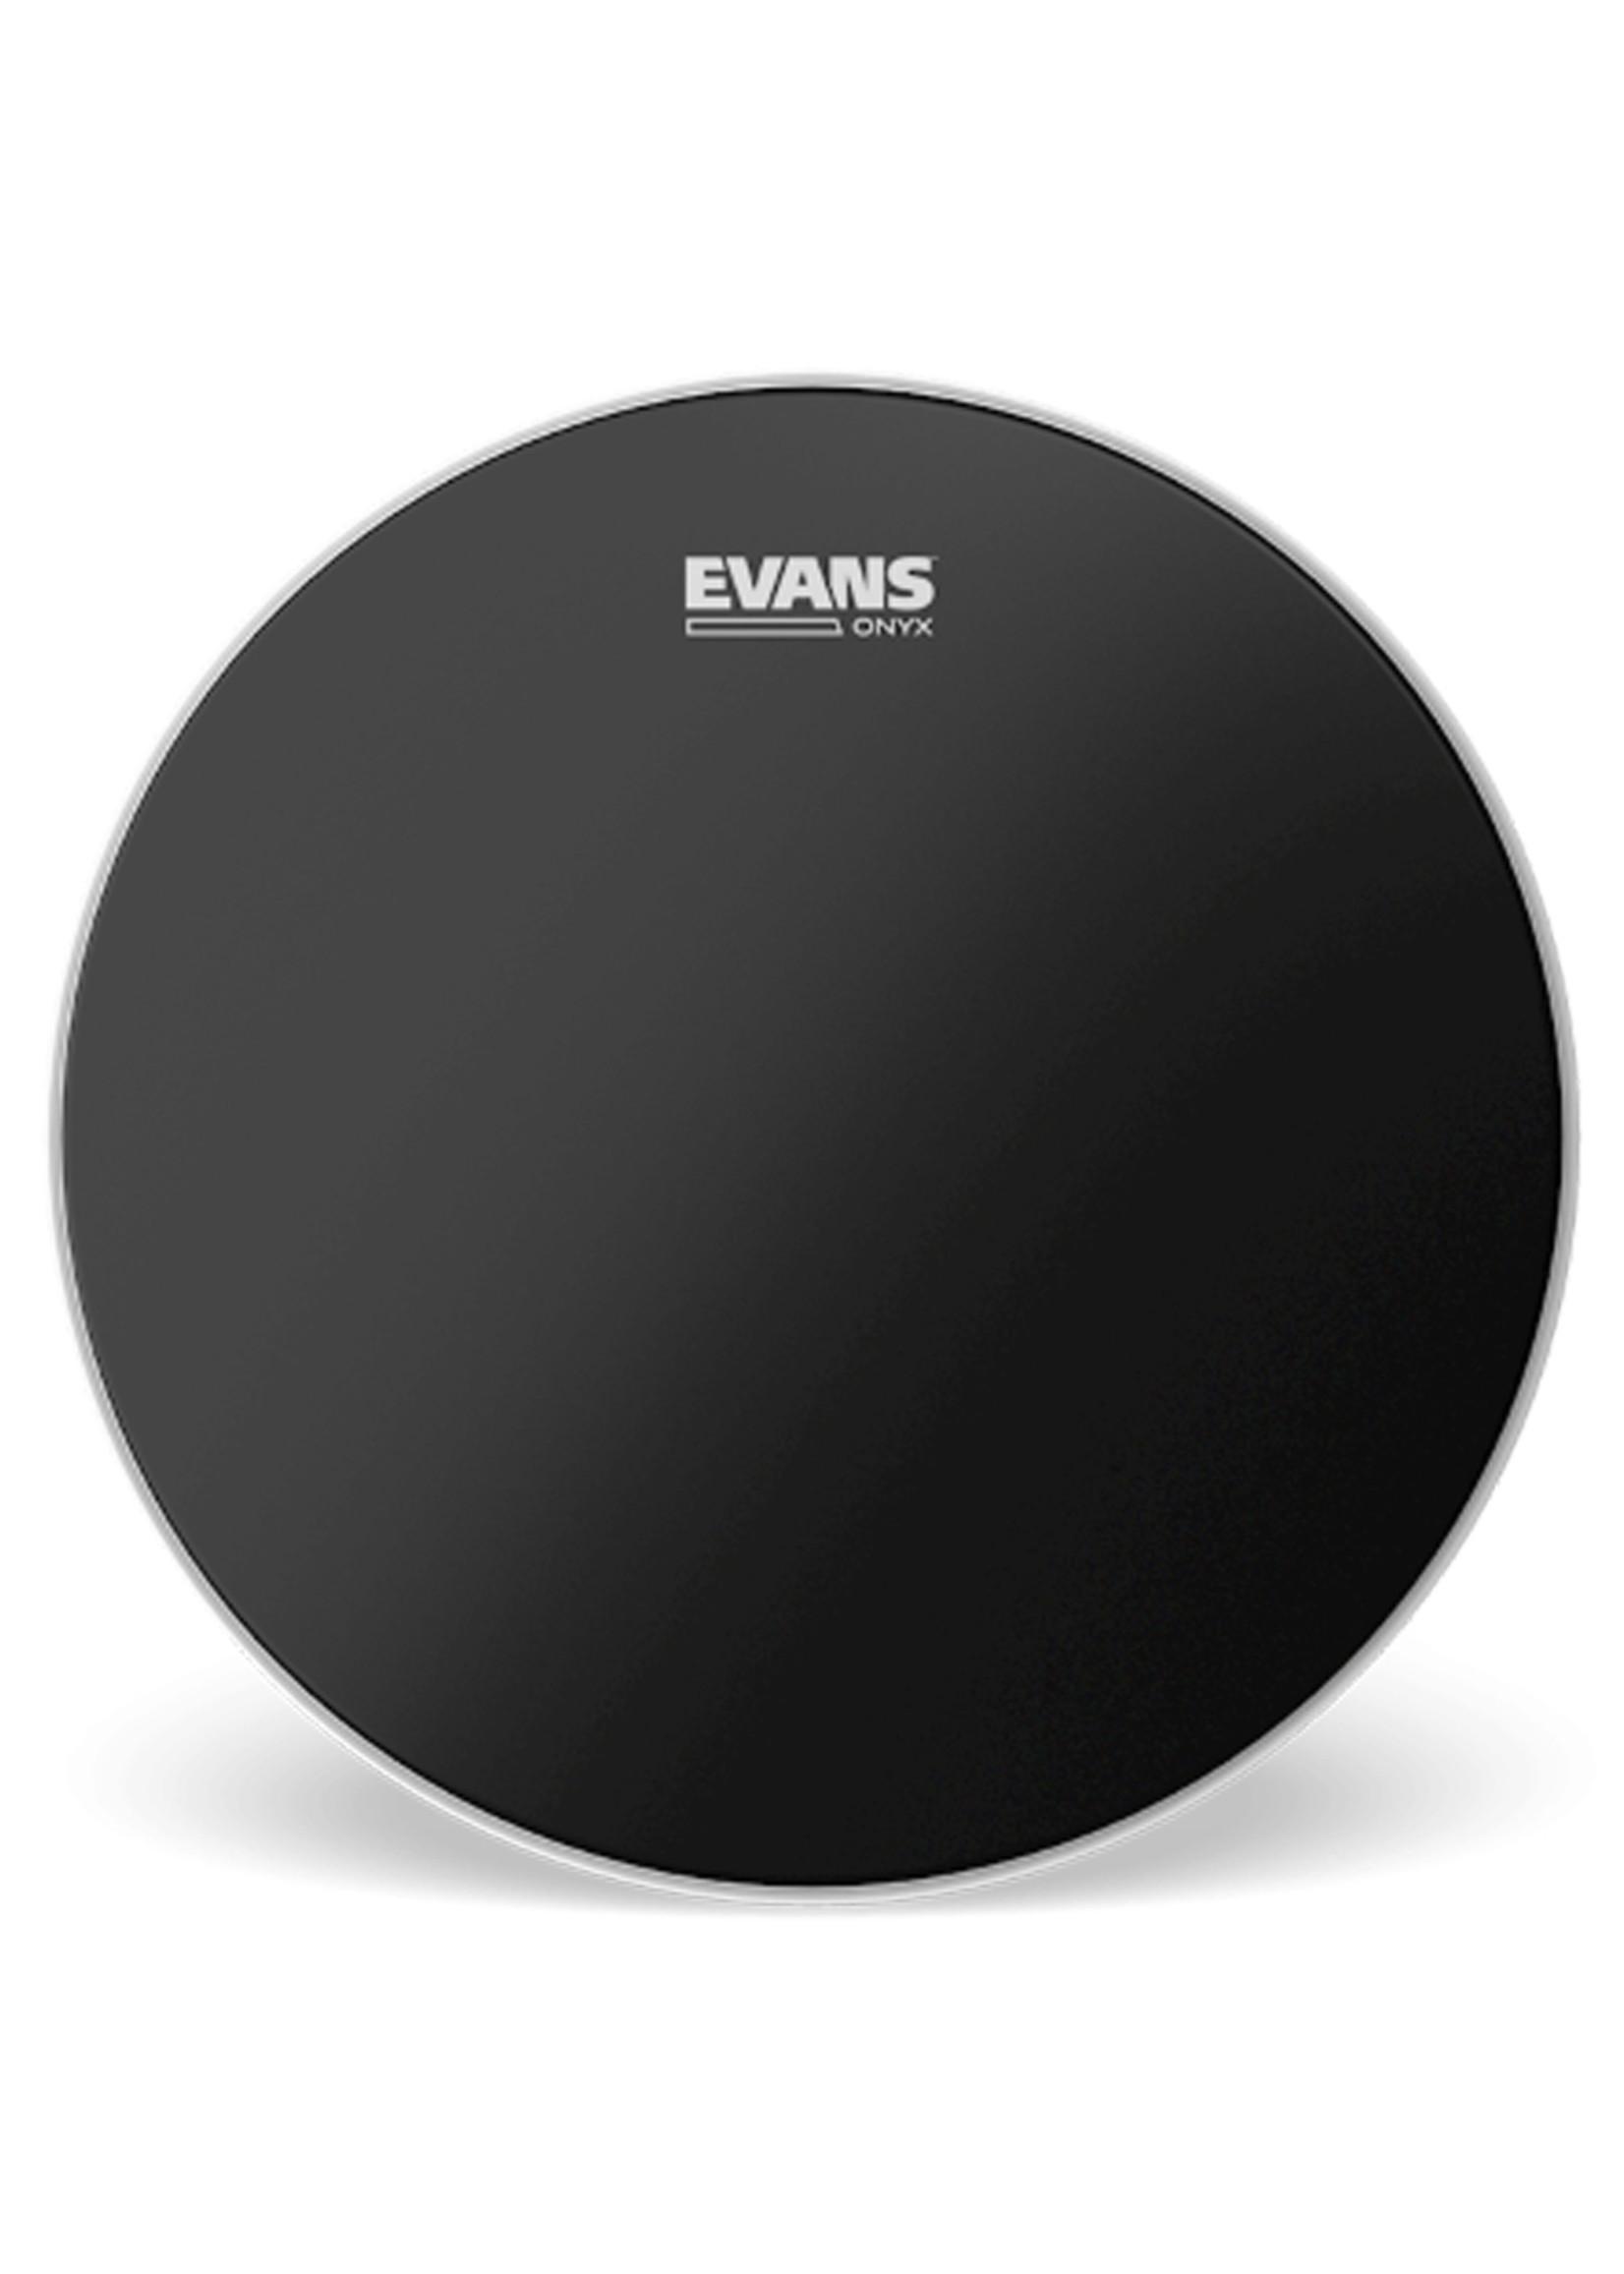 "Evans Evans 14"" Onyx"